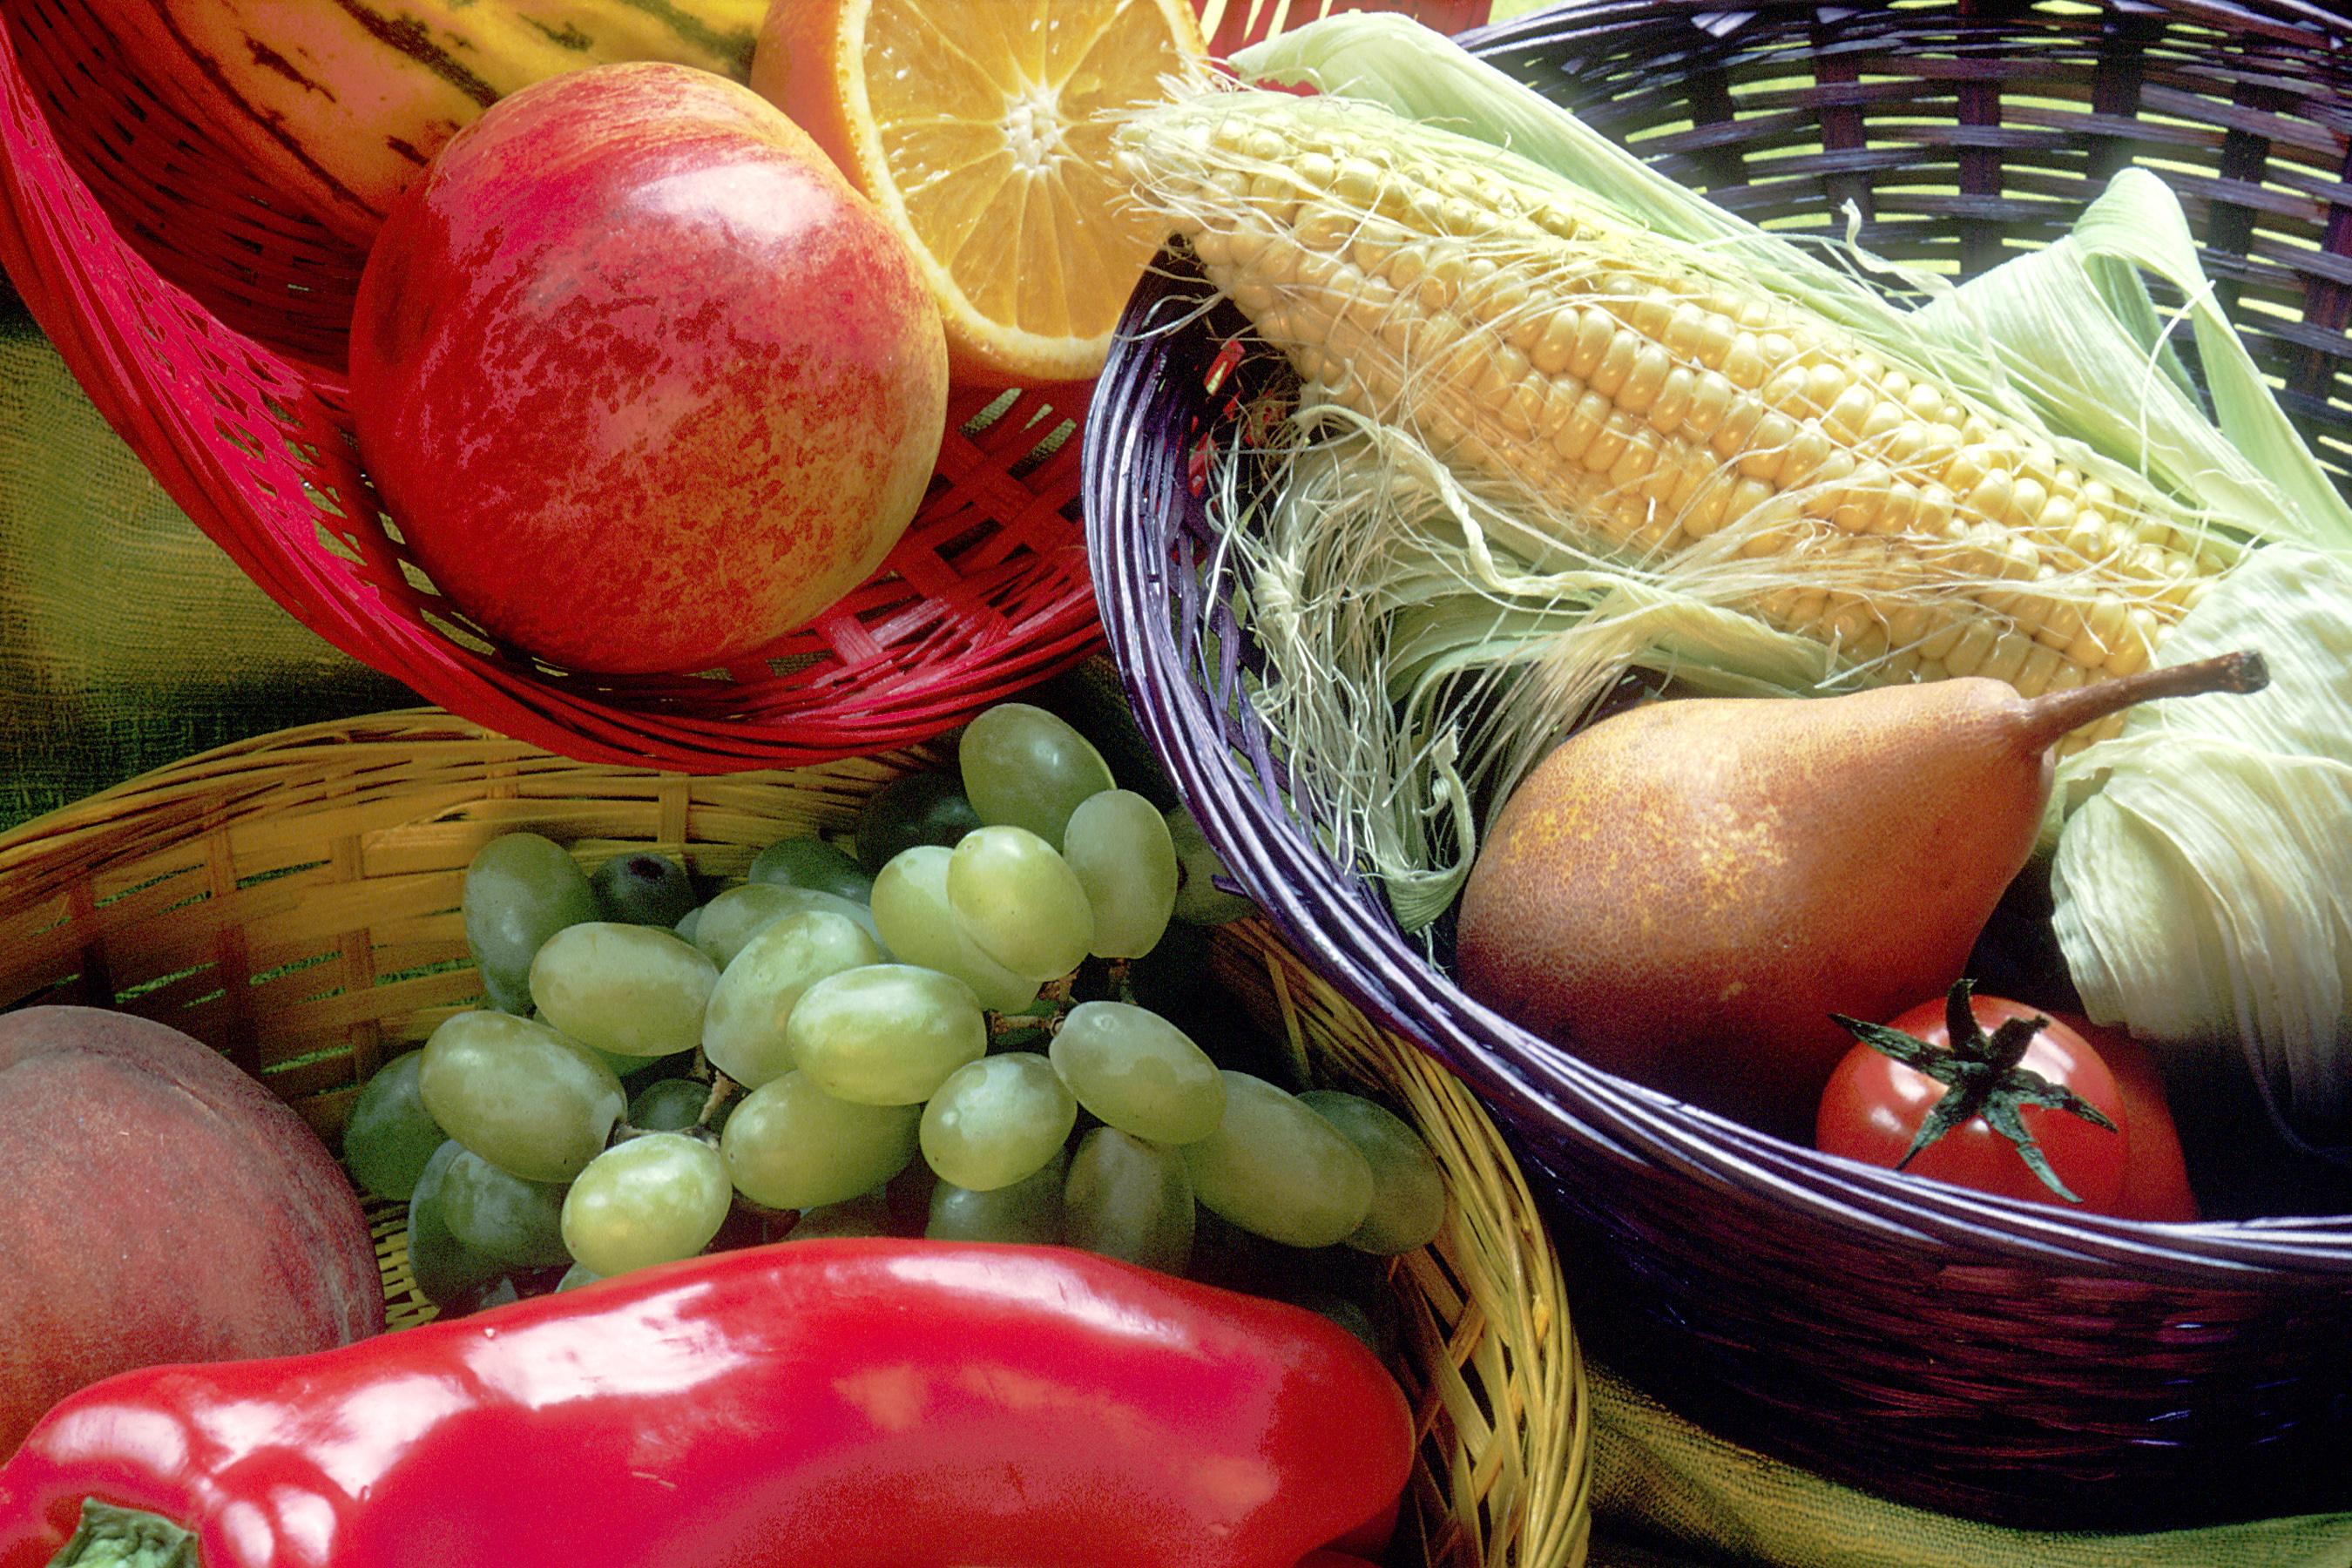 Filefruit and vegetables basketg wikimedia commons filefruit and vegetables basketg altavistaventures Gallery